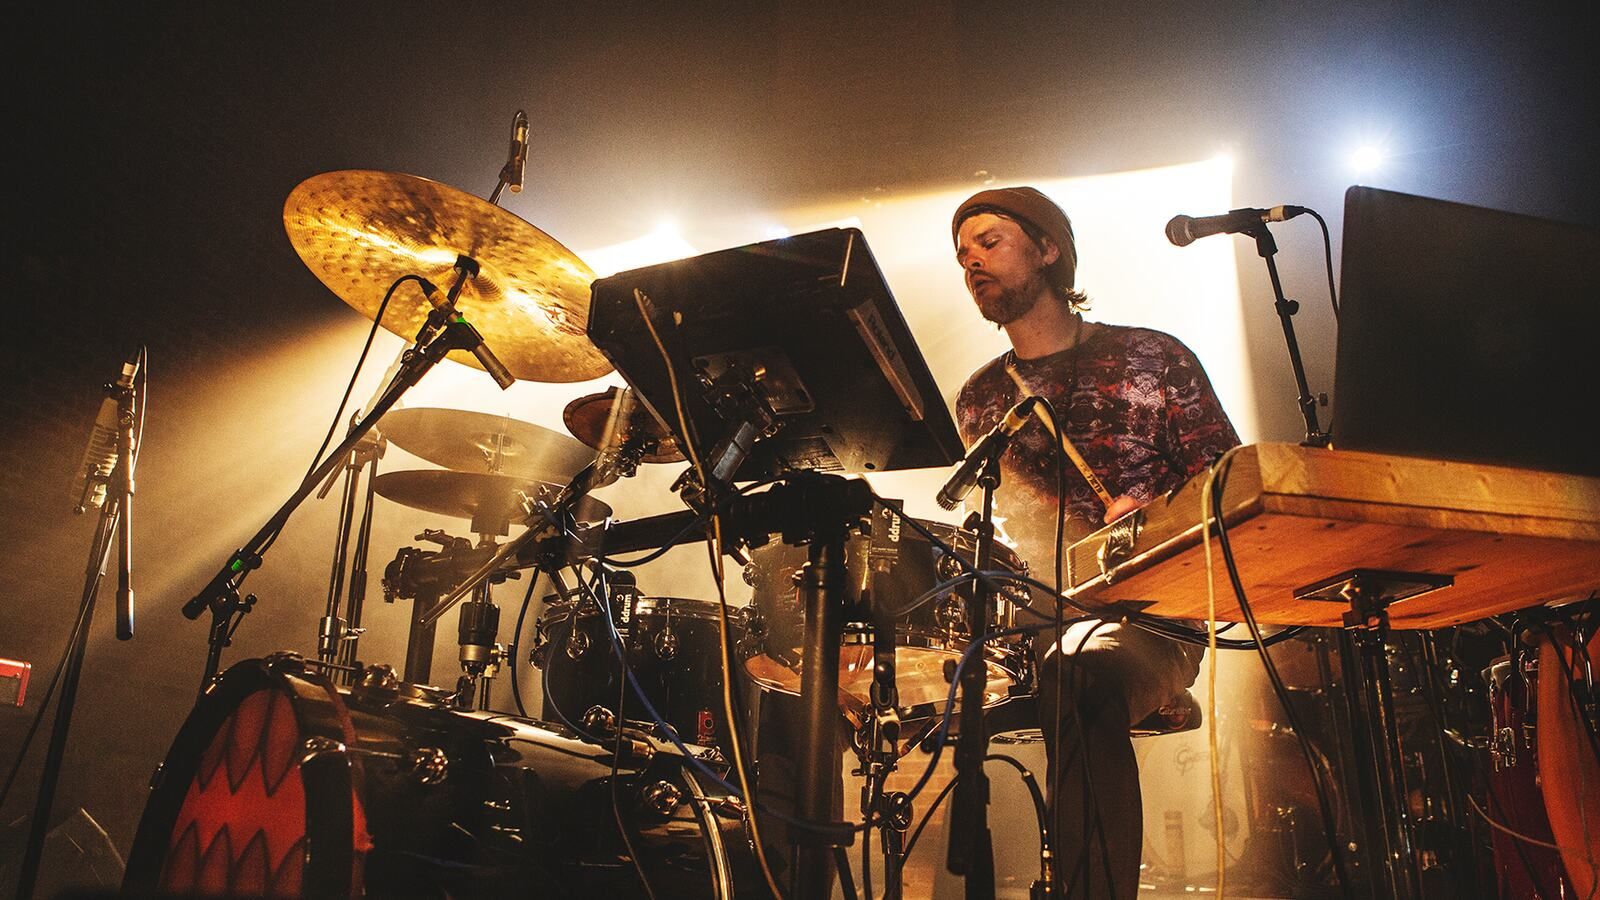 Chiminyo, musical artist